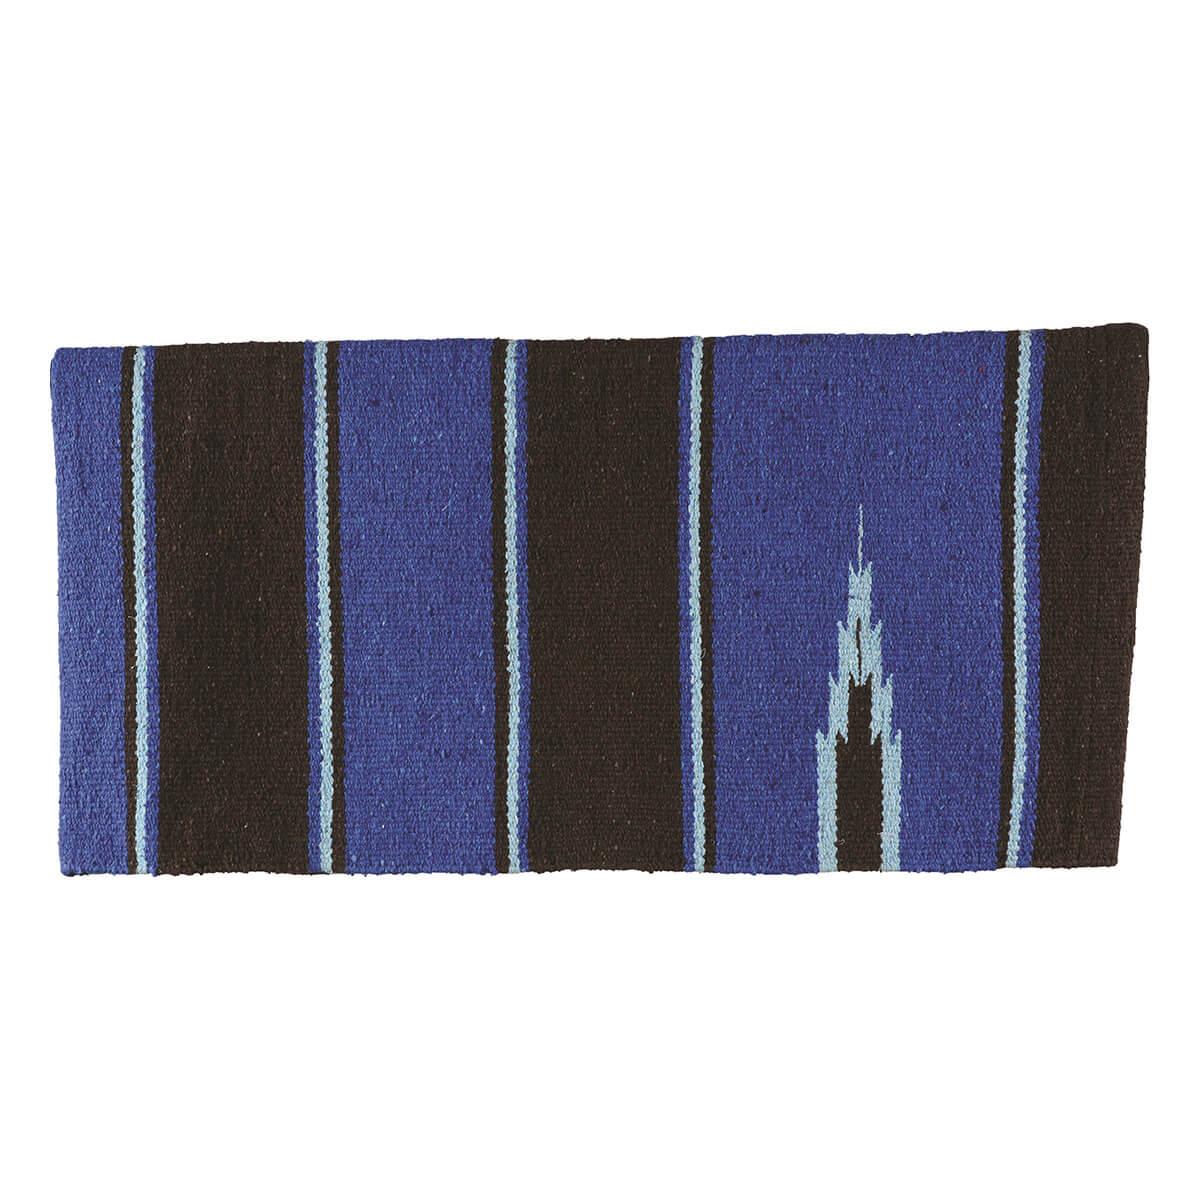 Sierra Navajo Saddle Blanket - Black/Blue